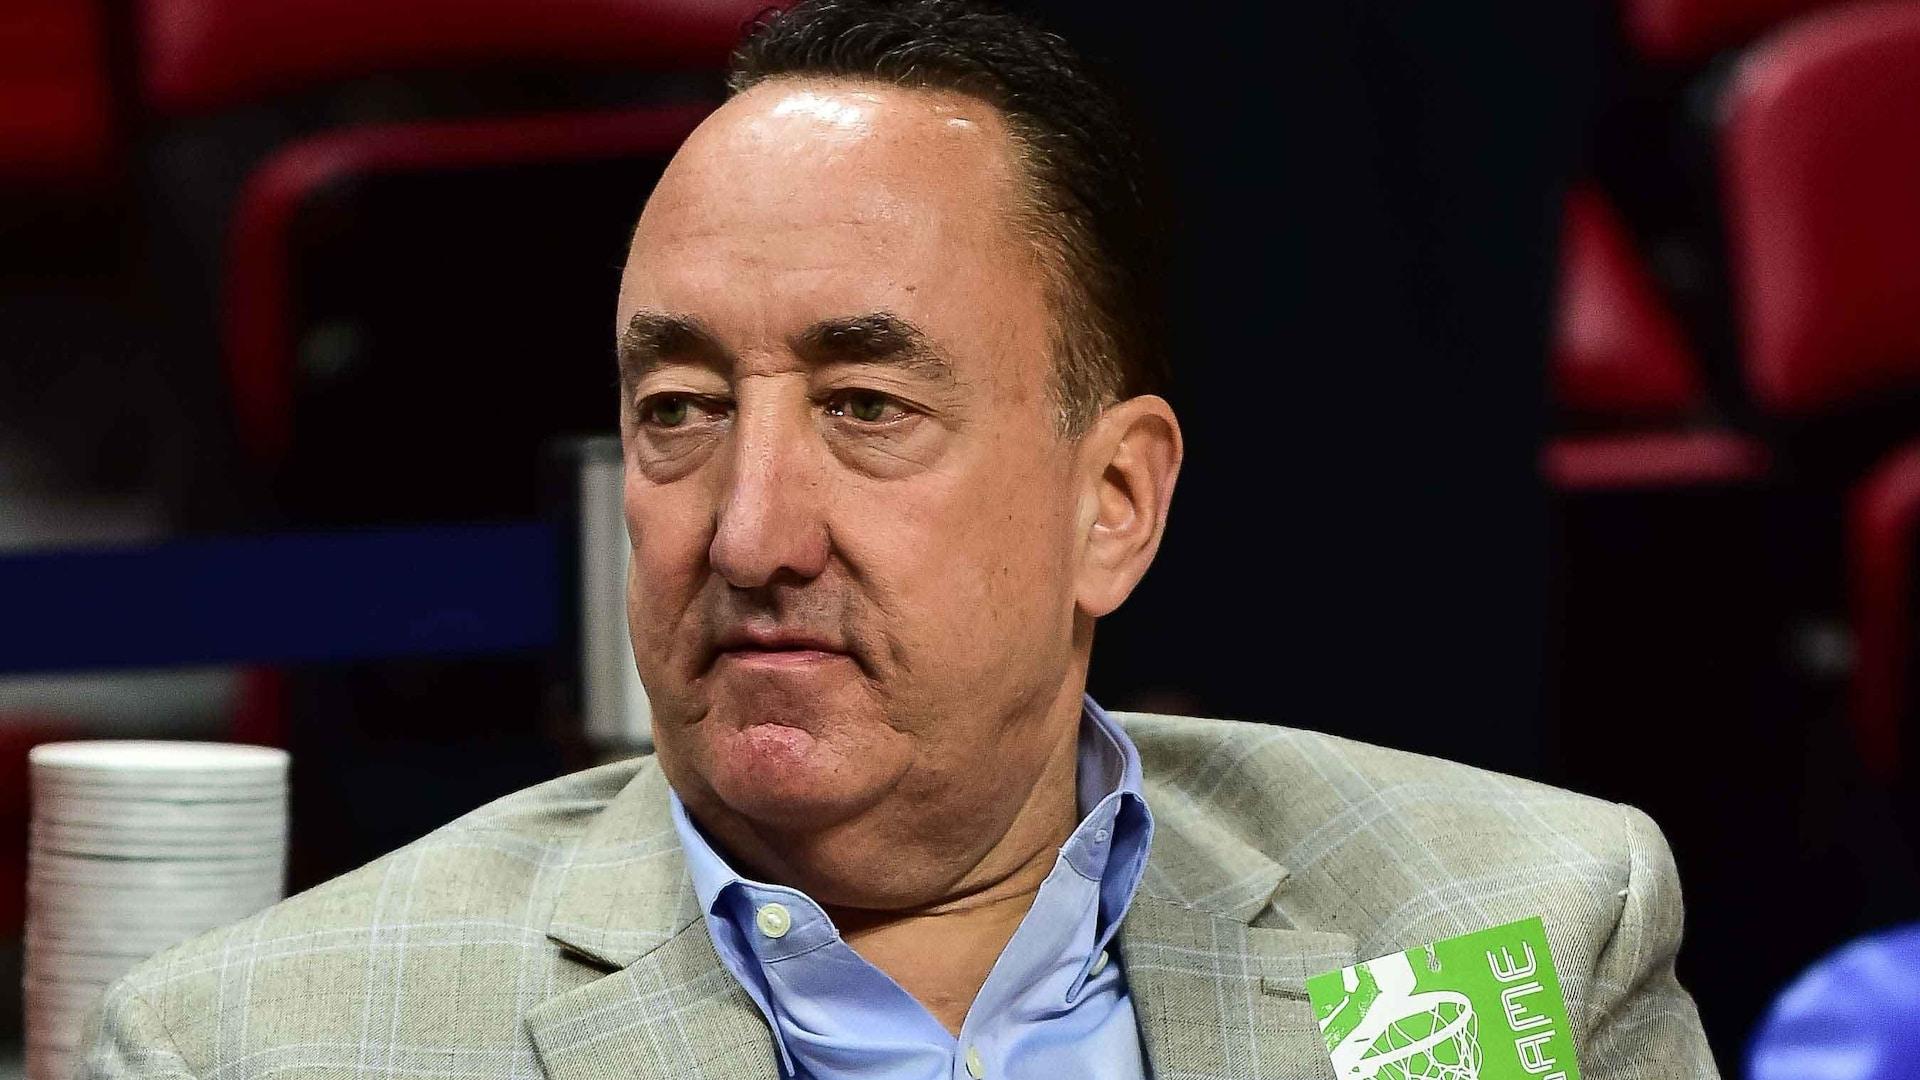 Bulls relieve GM Gar Forman of his duties, give John Paxson new role